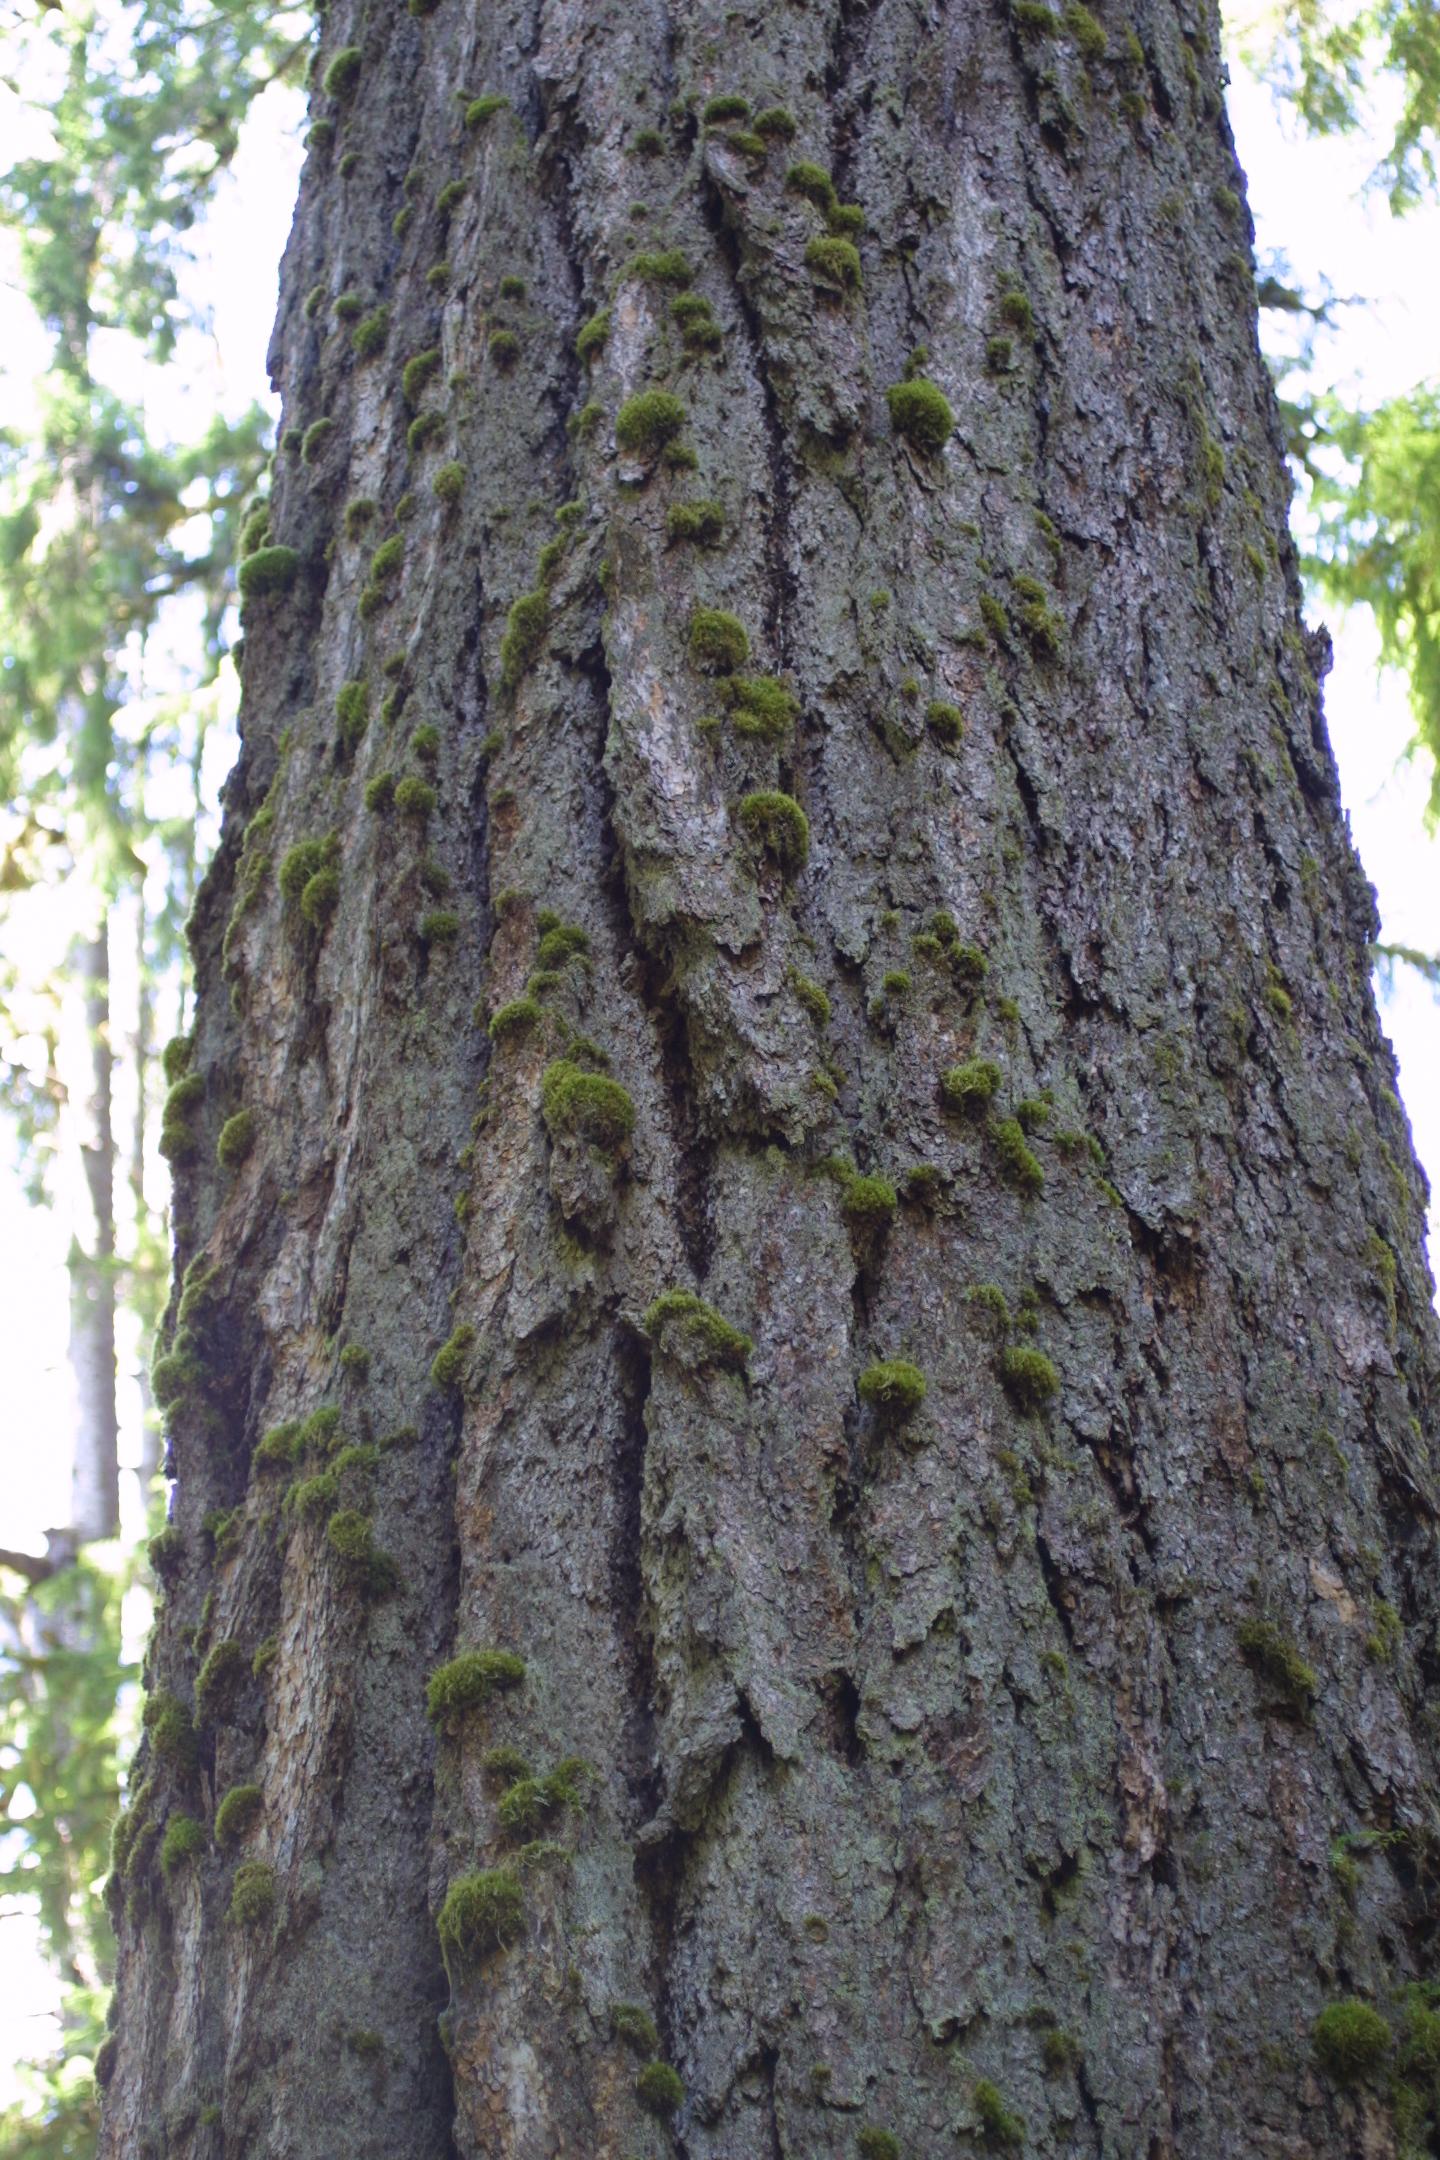 Pseudotsuga menziesii (Douglas-fir)